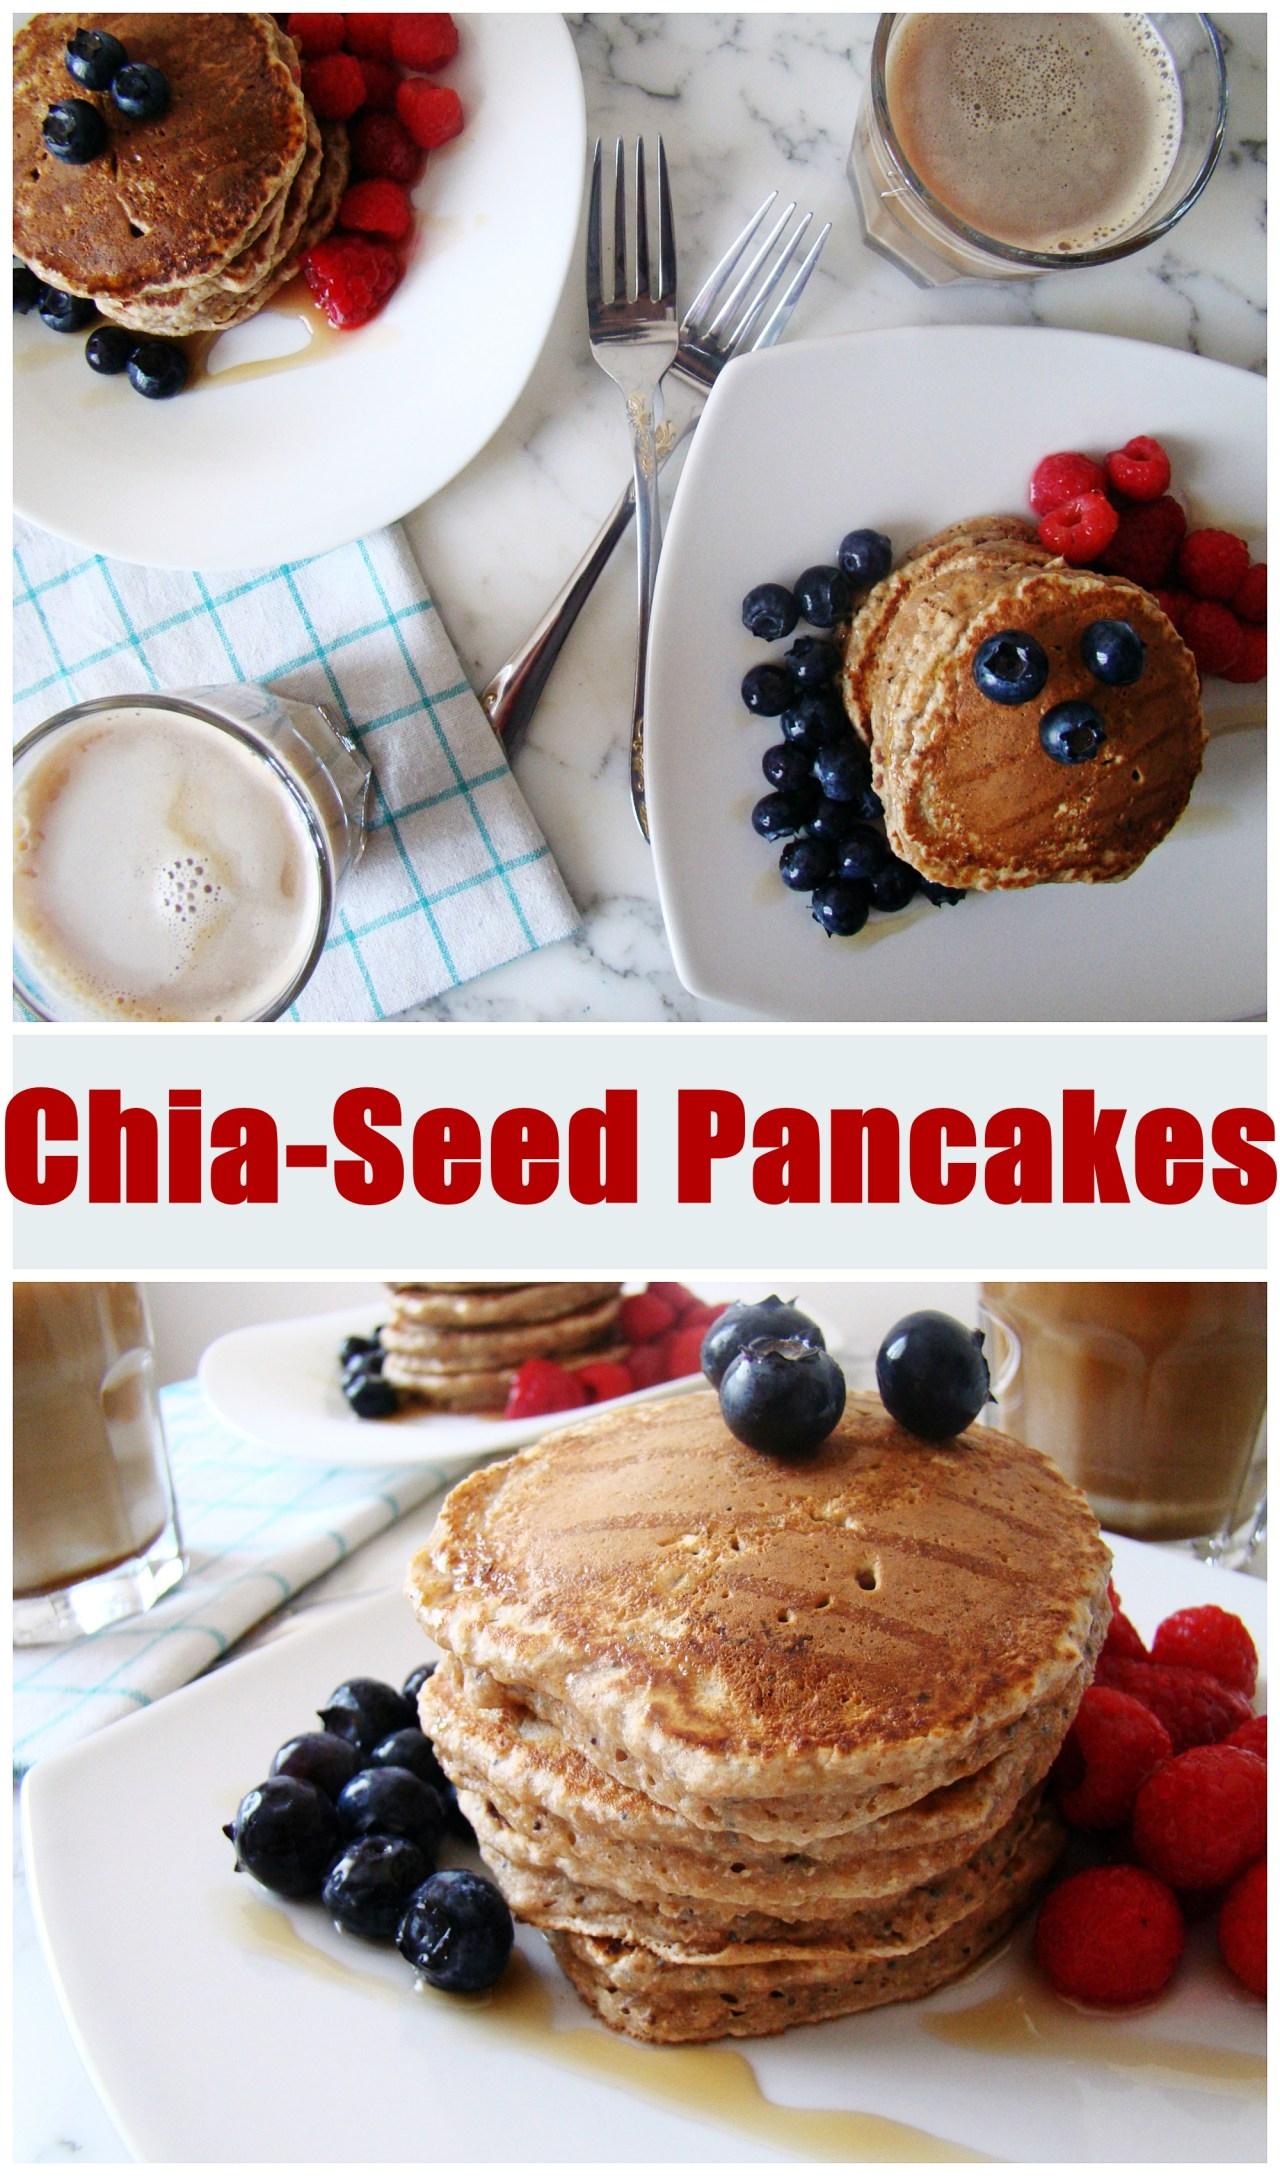 Chia-Seed Pancakes